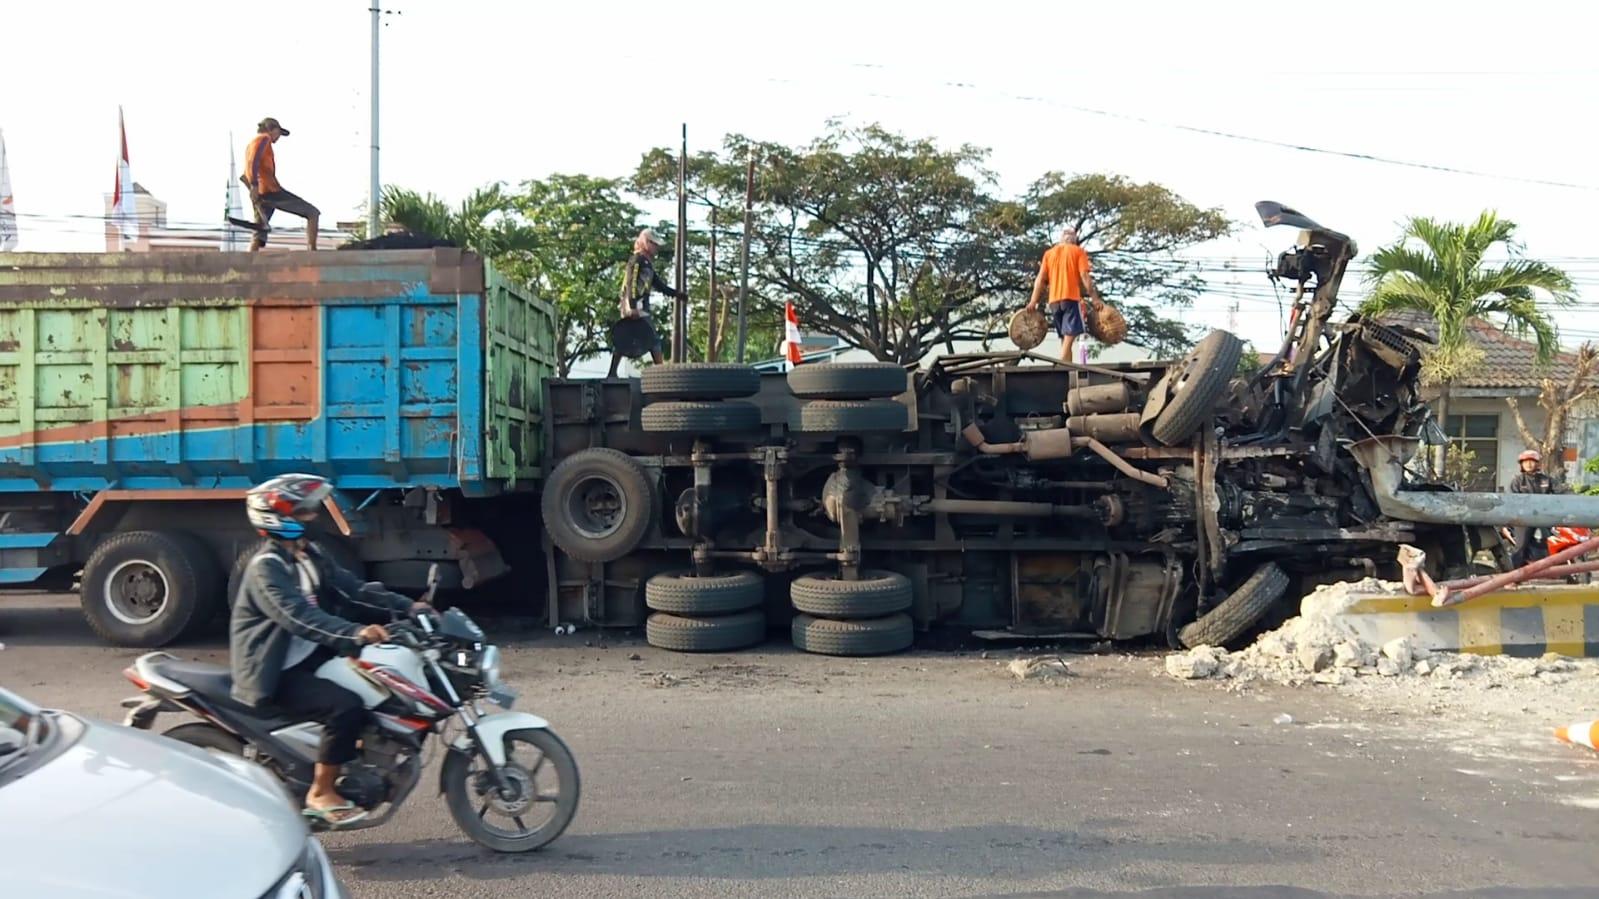 Kasat Lantas Polres Ciko : Insiden Truk Terguling, Tidak Ada Korban Jiwa